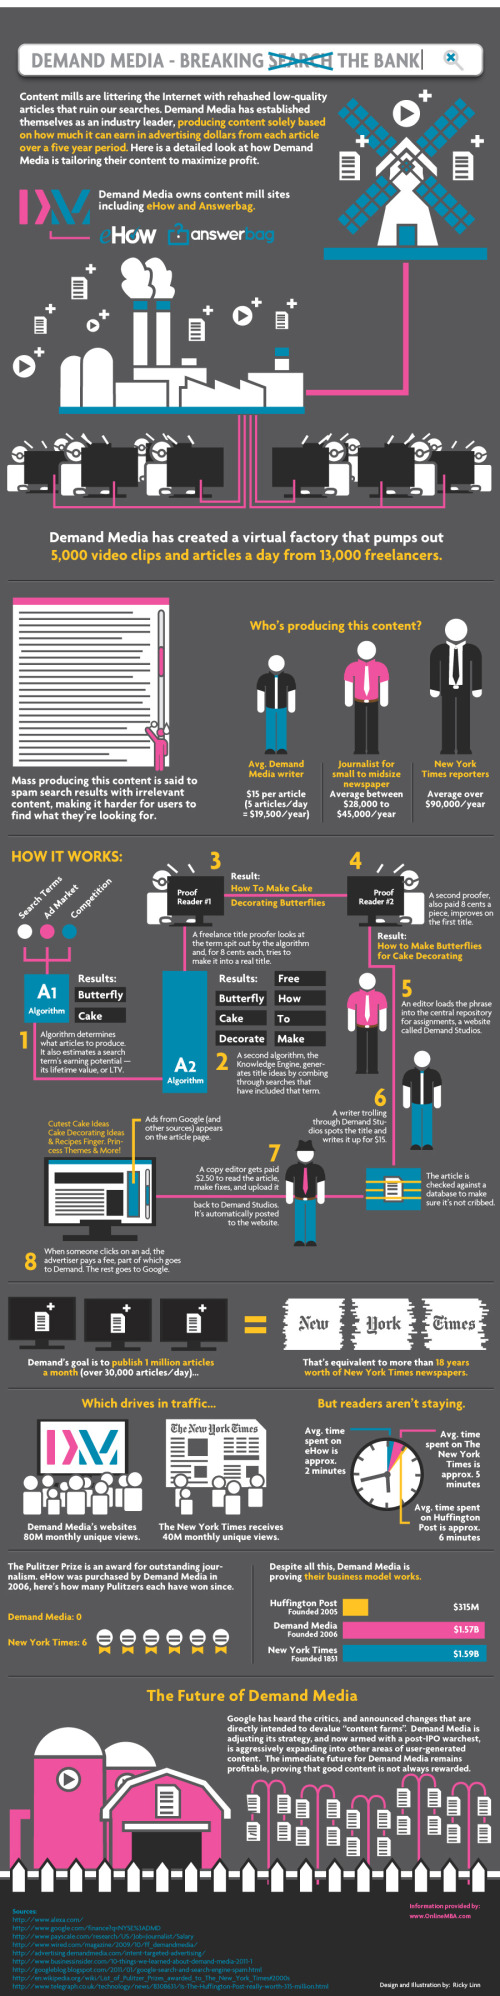 Demand Media - Breaking the Bank infographic